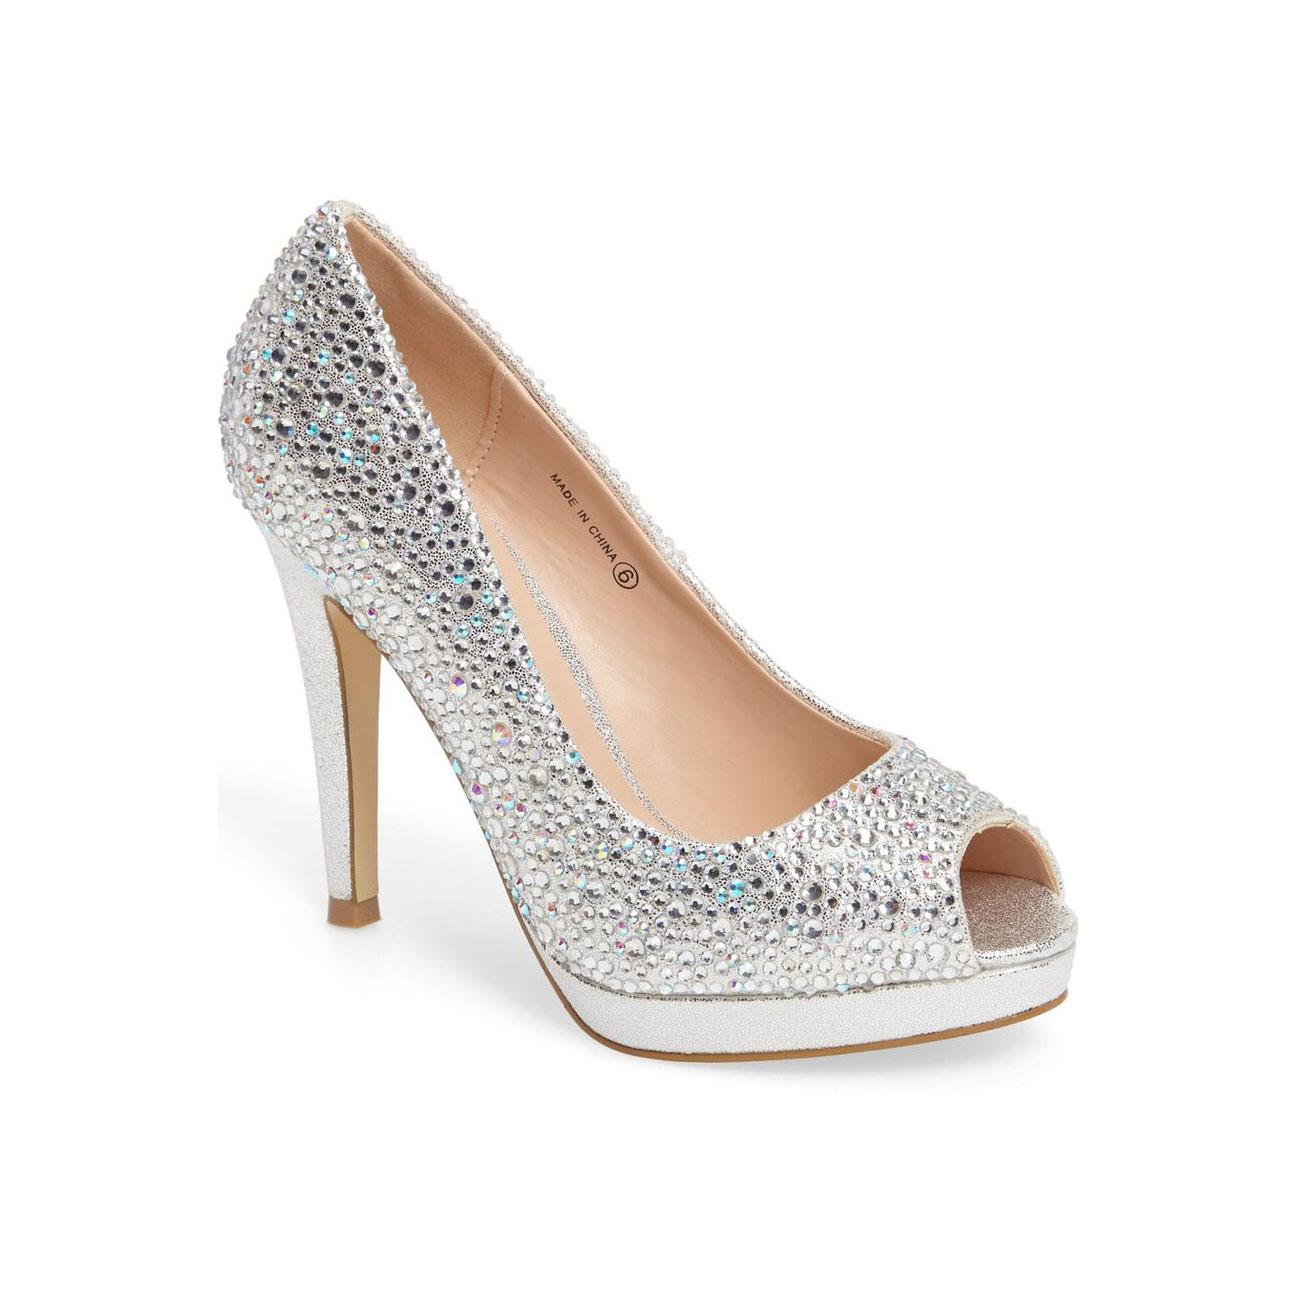 4 Inch Silver Heels